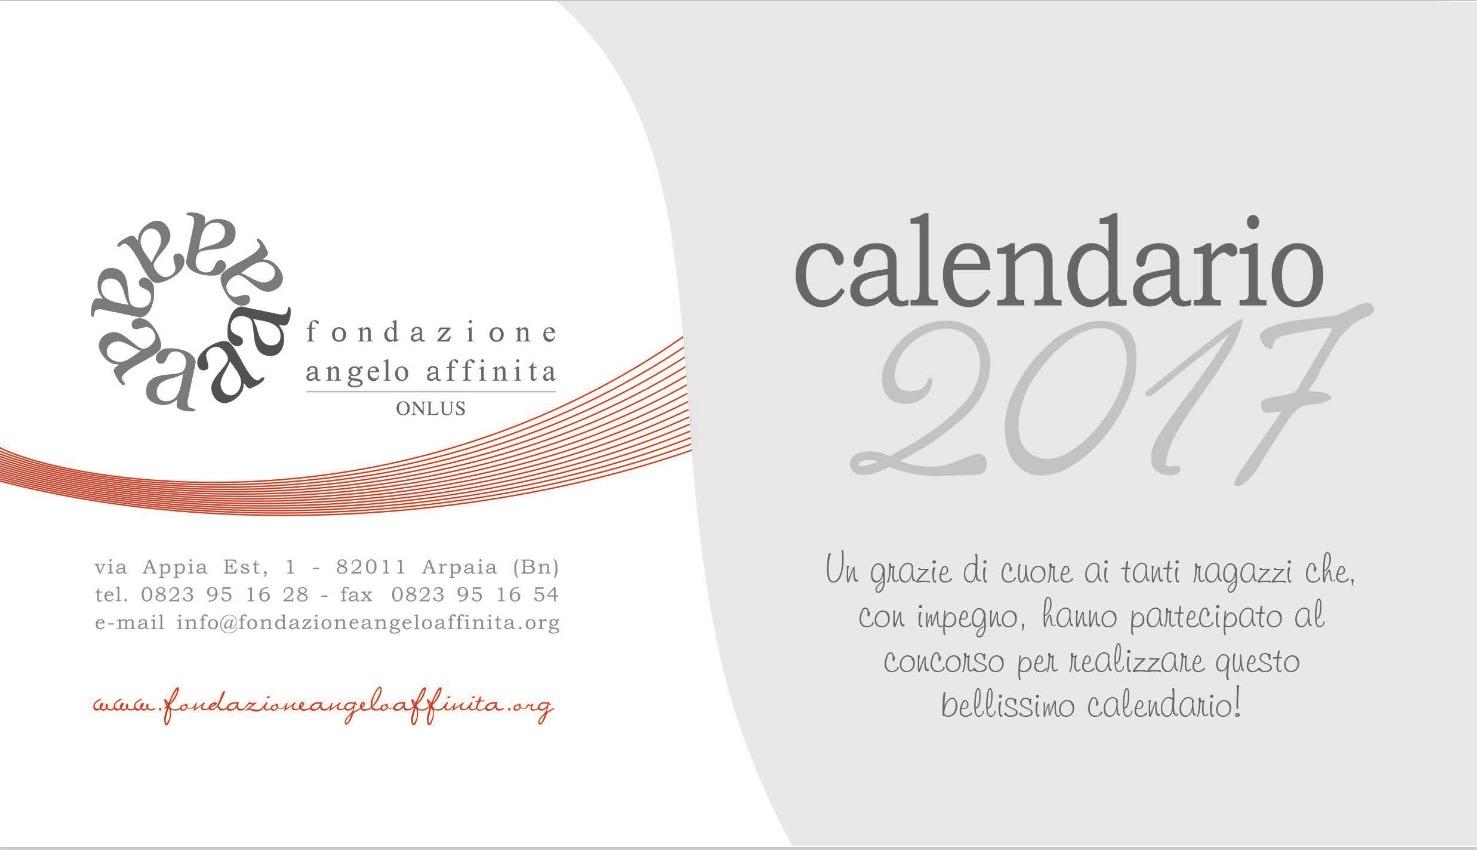 calendario-2017-fondazione-angelo-affinita_14